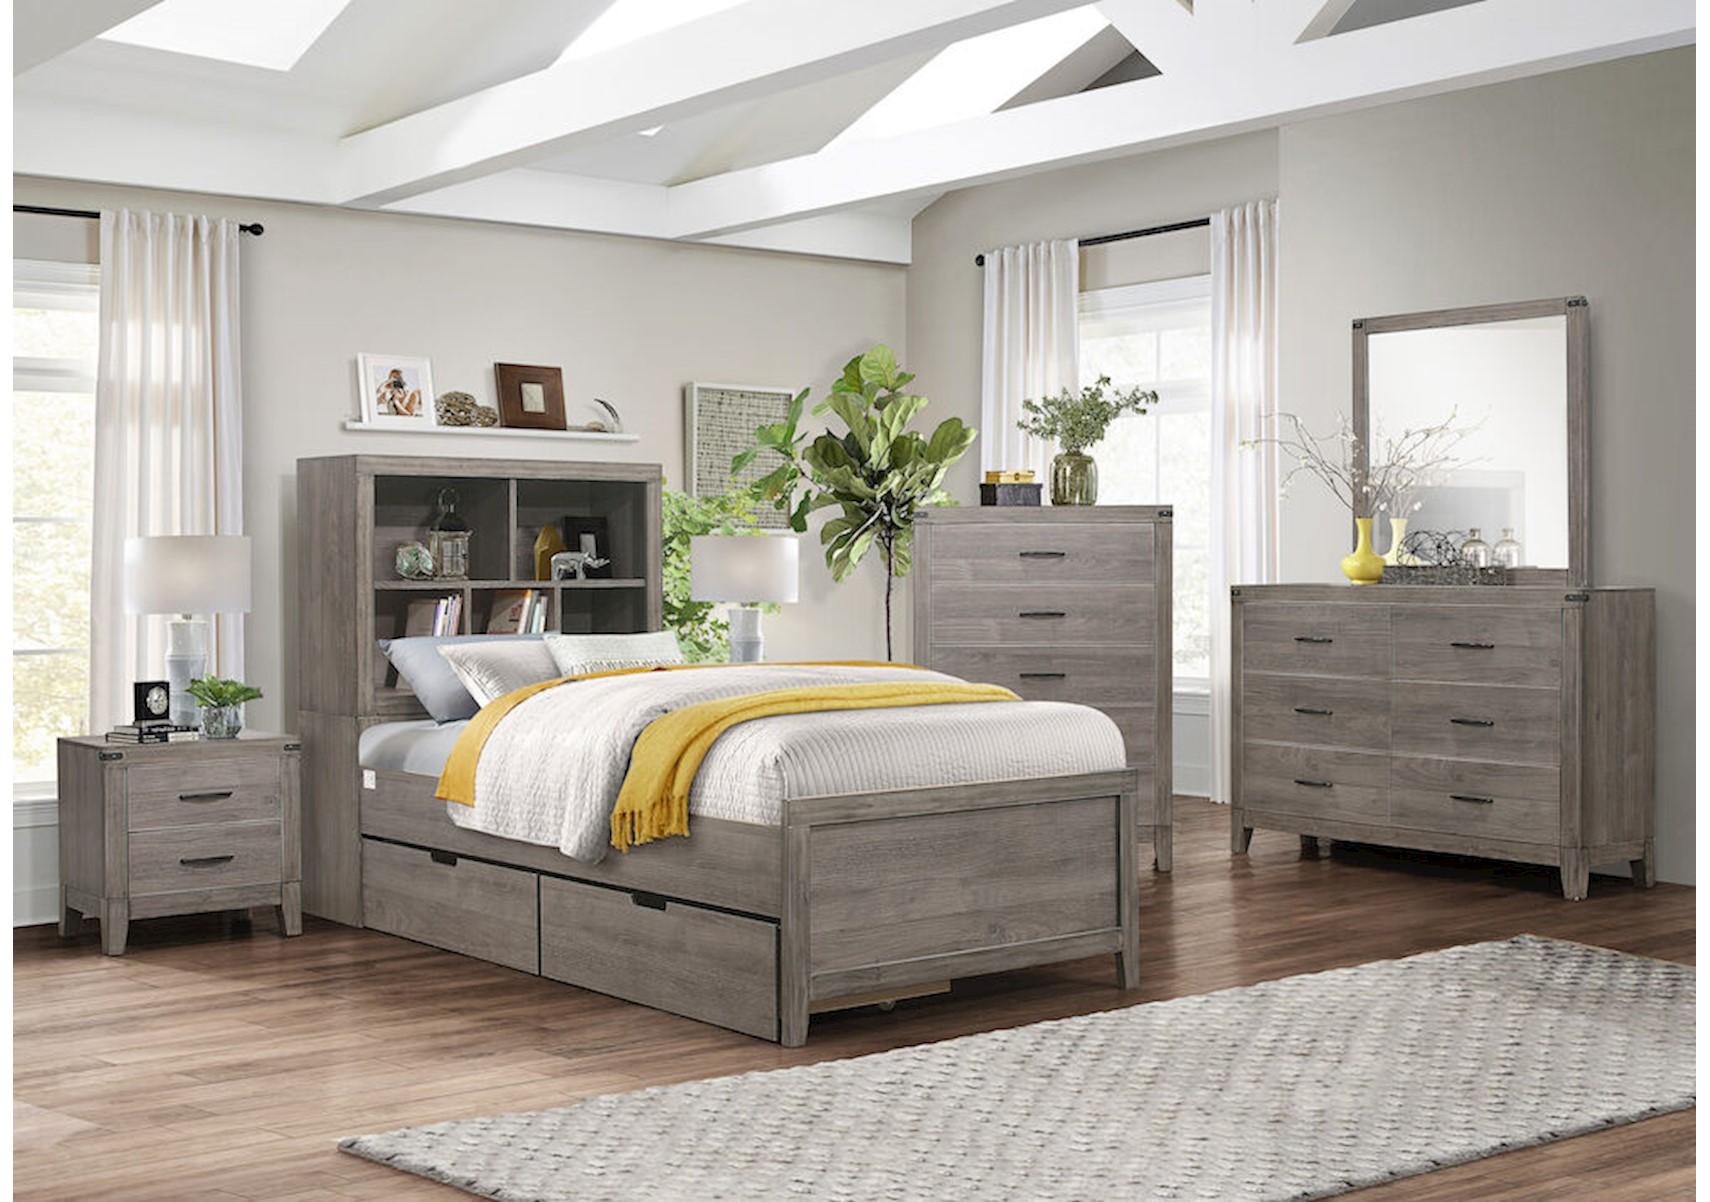 Lacks | Woodrow 4-Pc Kids Twin Bedroom Set